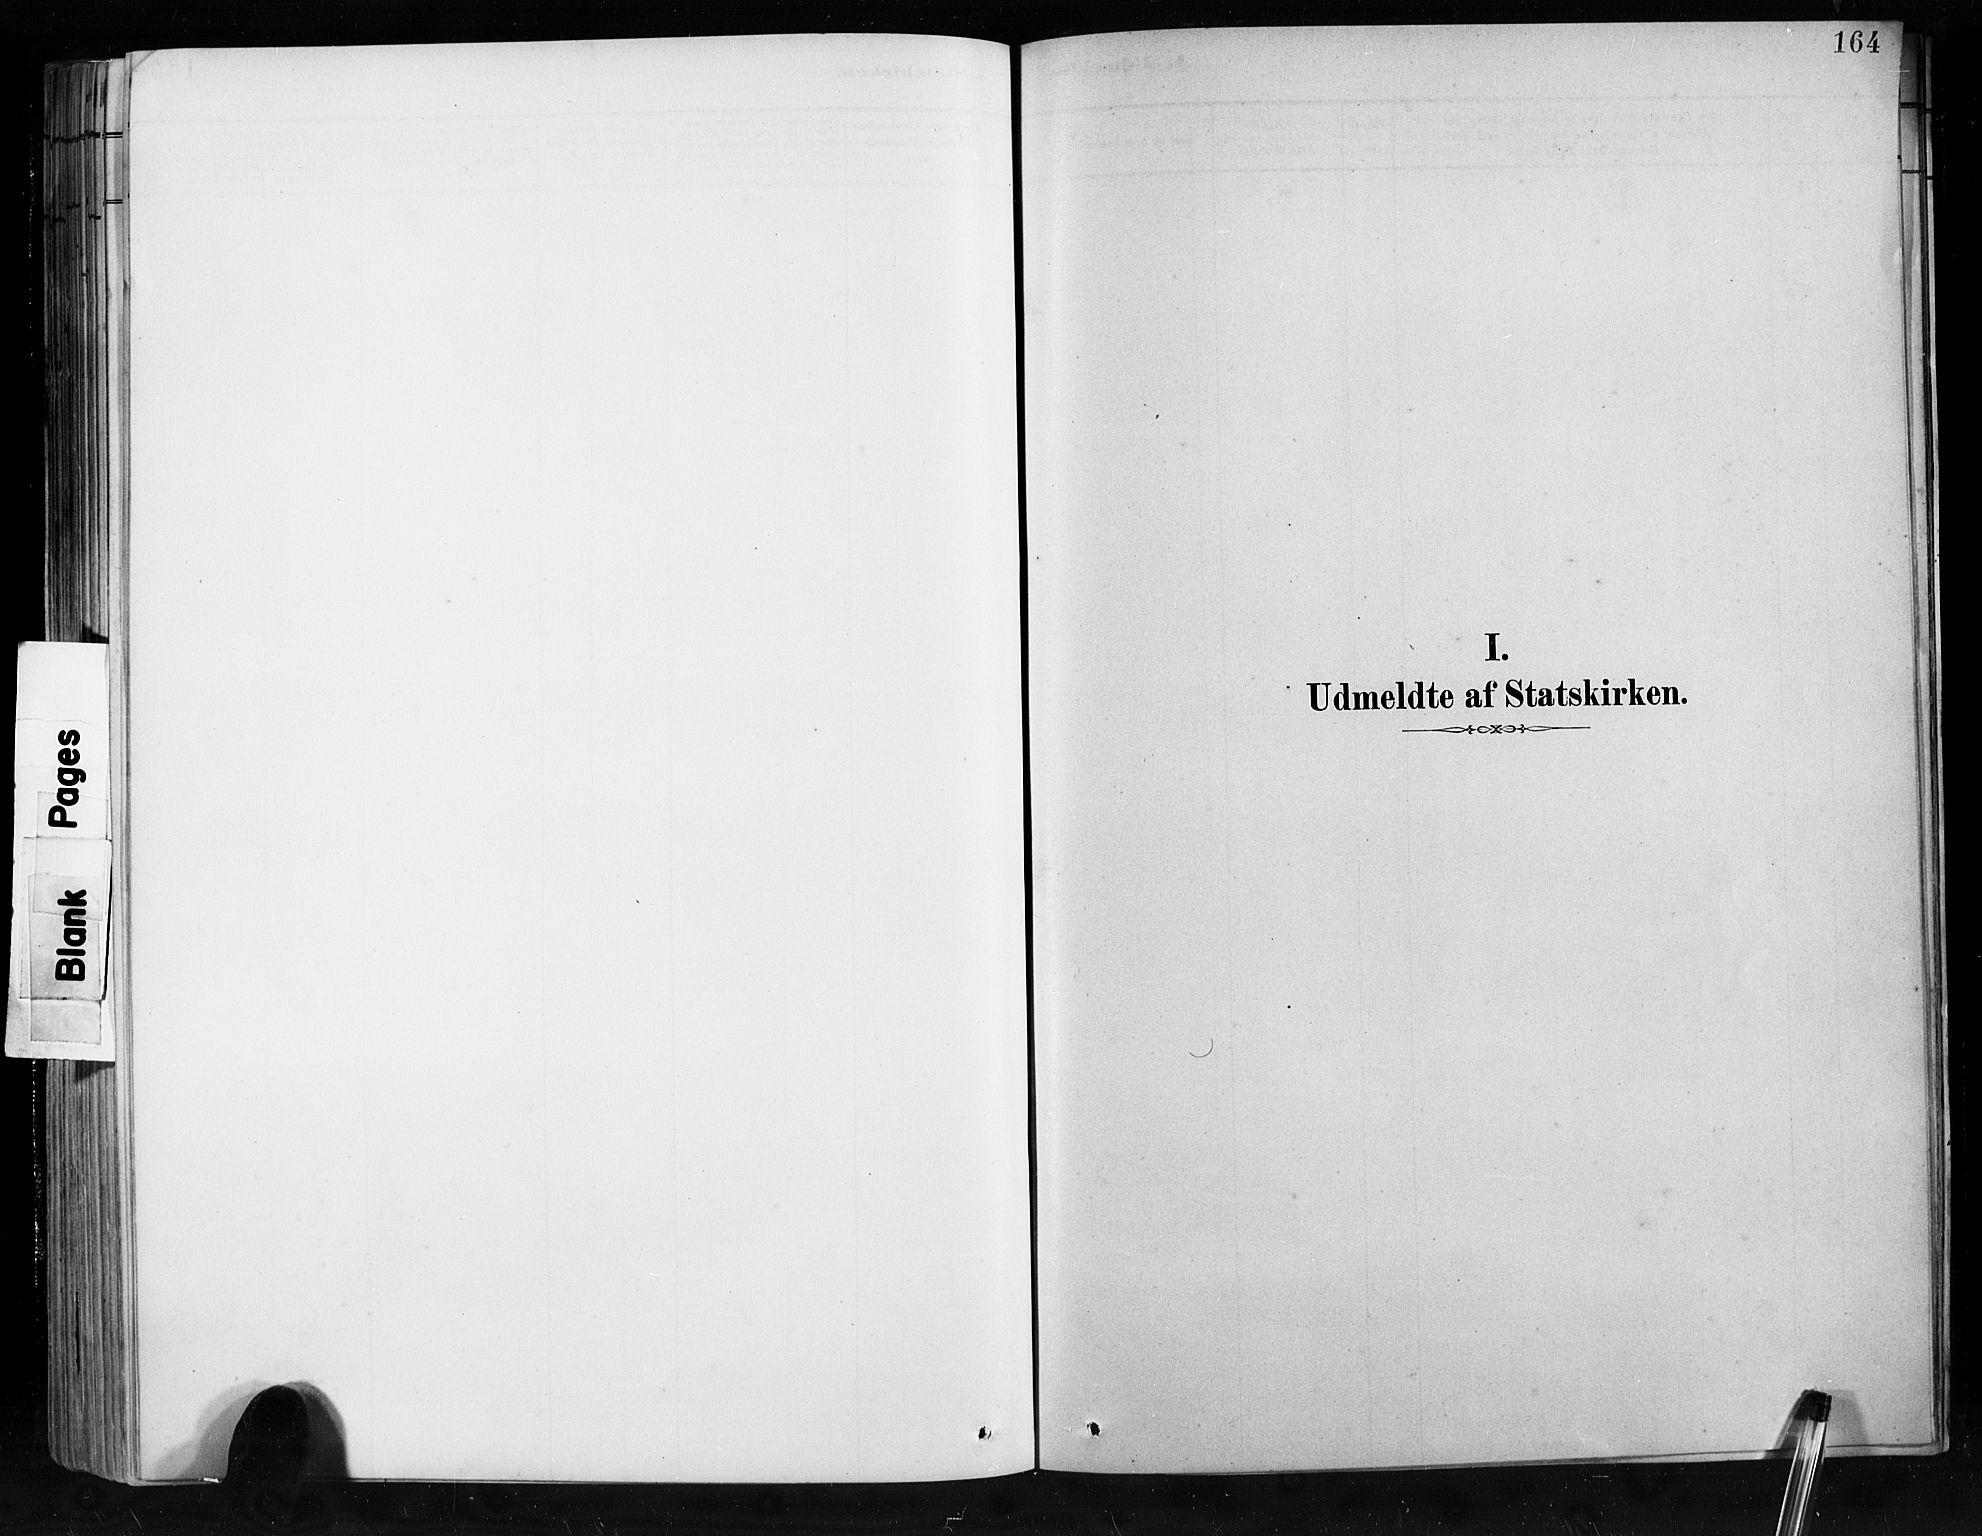 SAB, Jostedal sokneprestembete, H/Hab/Habb/L0001: Klokkerbok nr. B 1, 1882-1921, s. 164